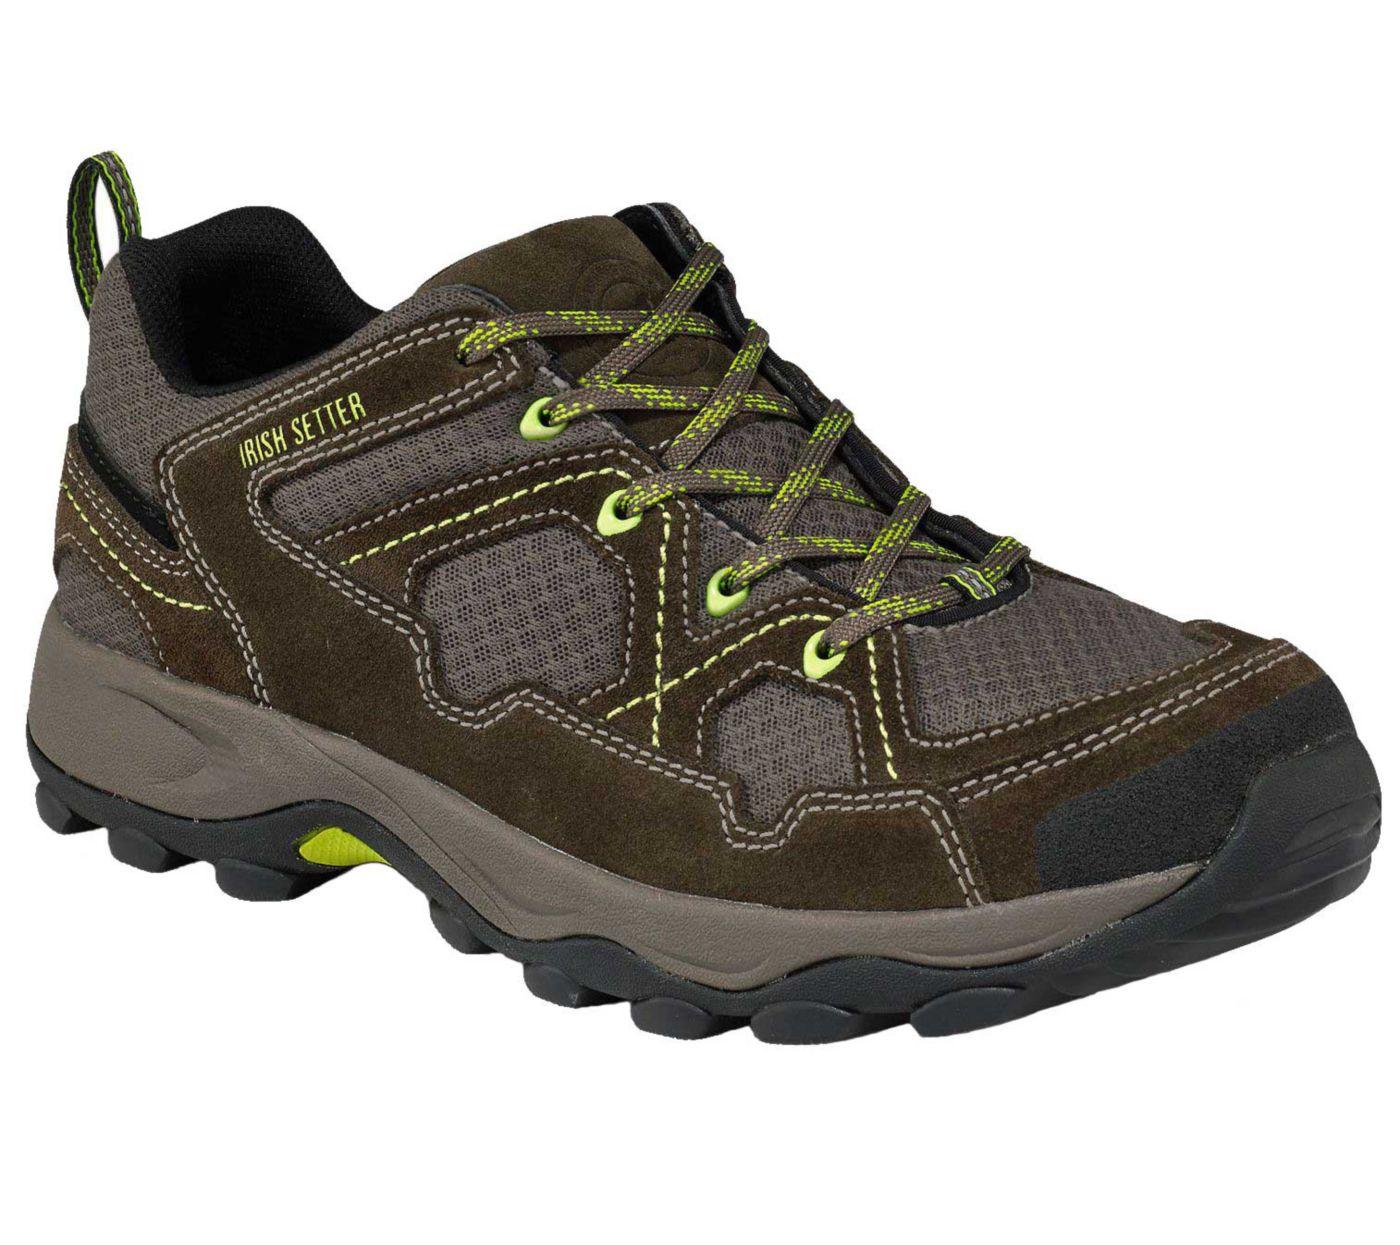 Irish Setter Men's Afton Oxford Steel Toe Work Shoes